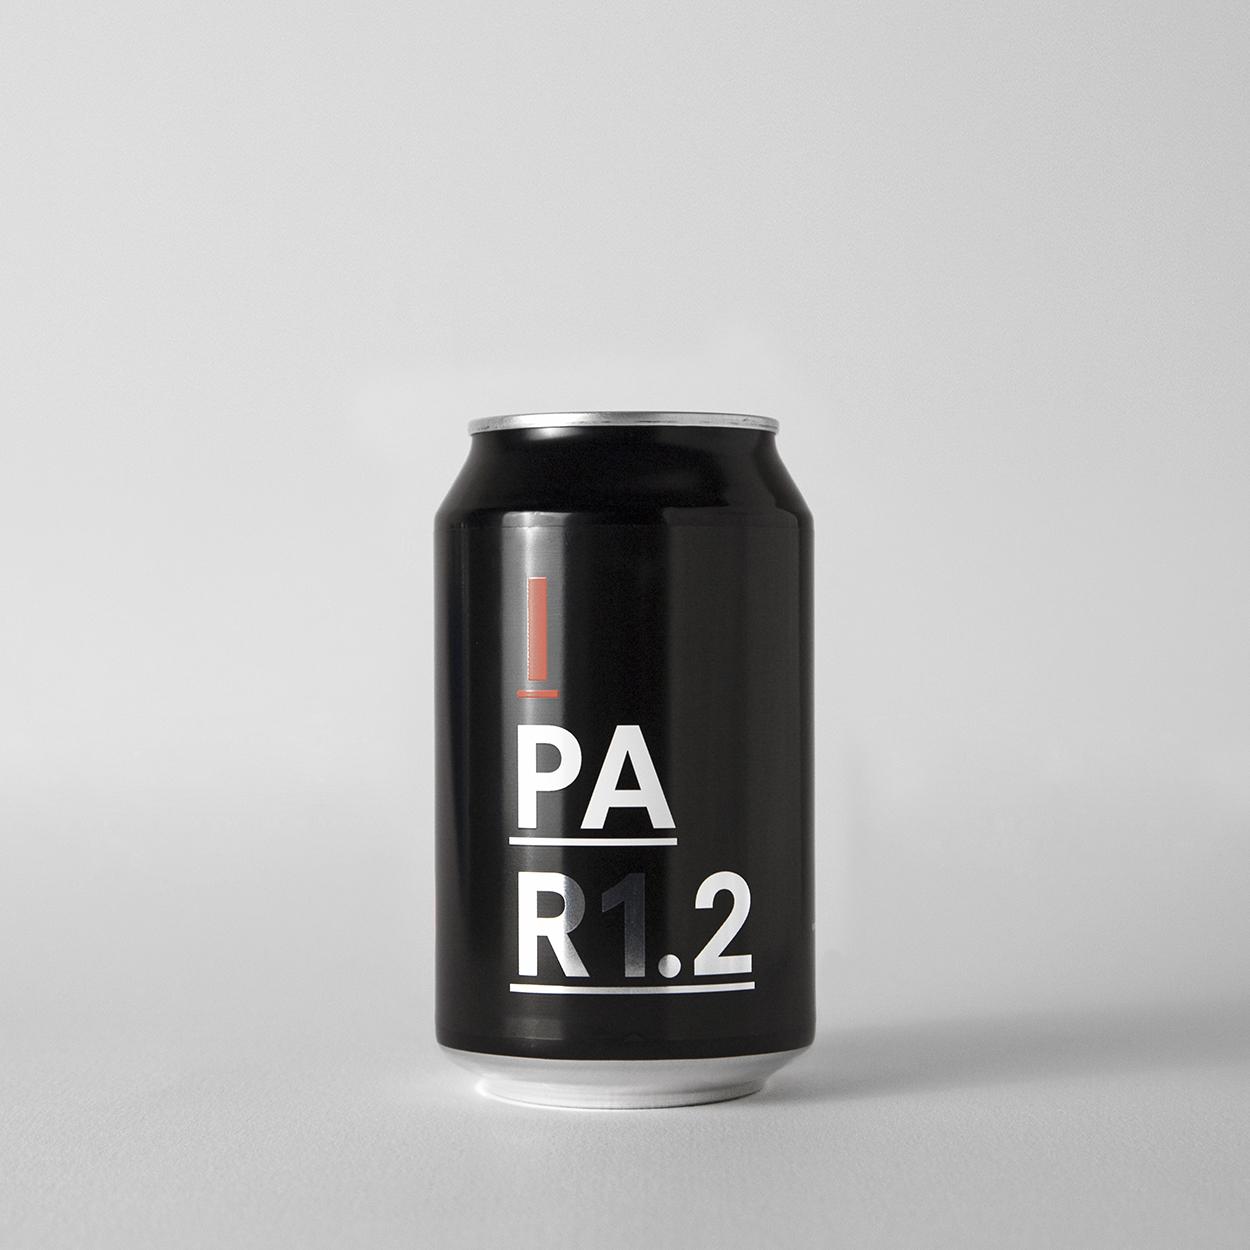 IPA R1.2